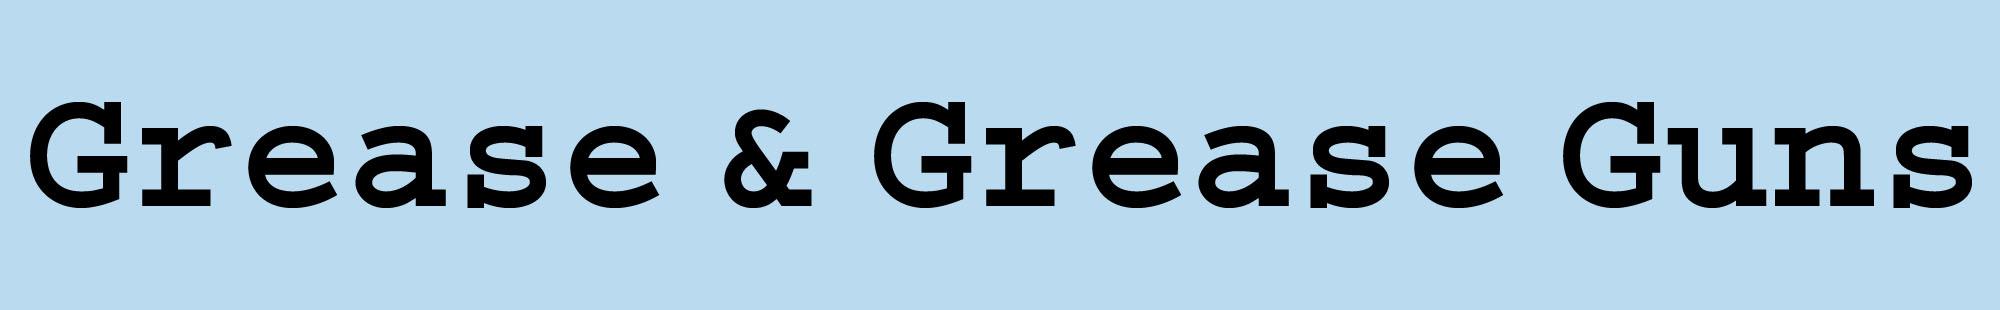 grease sign.jpg